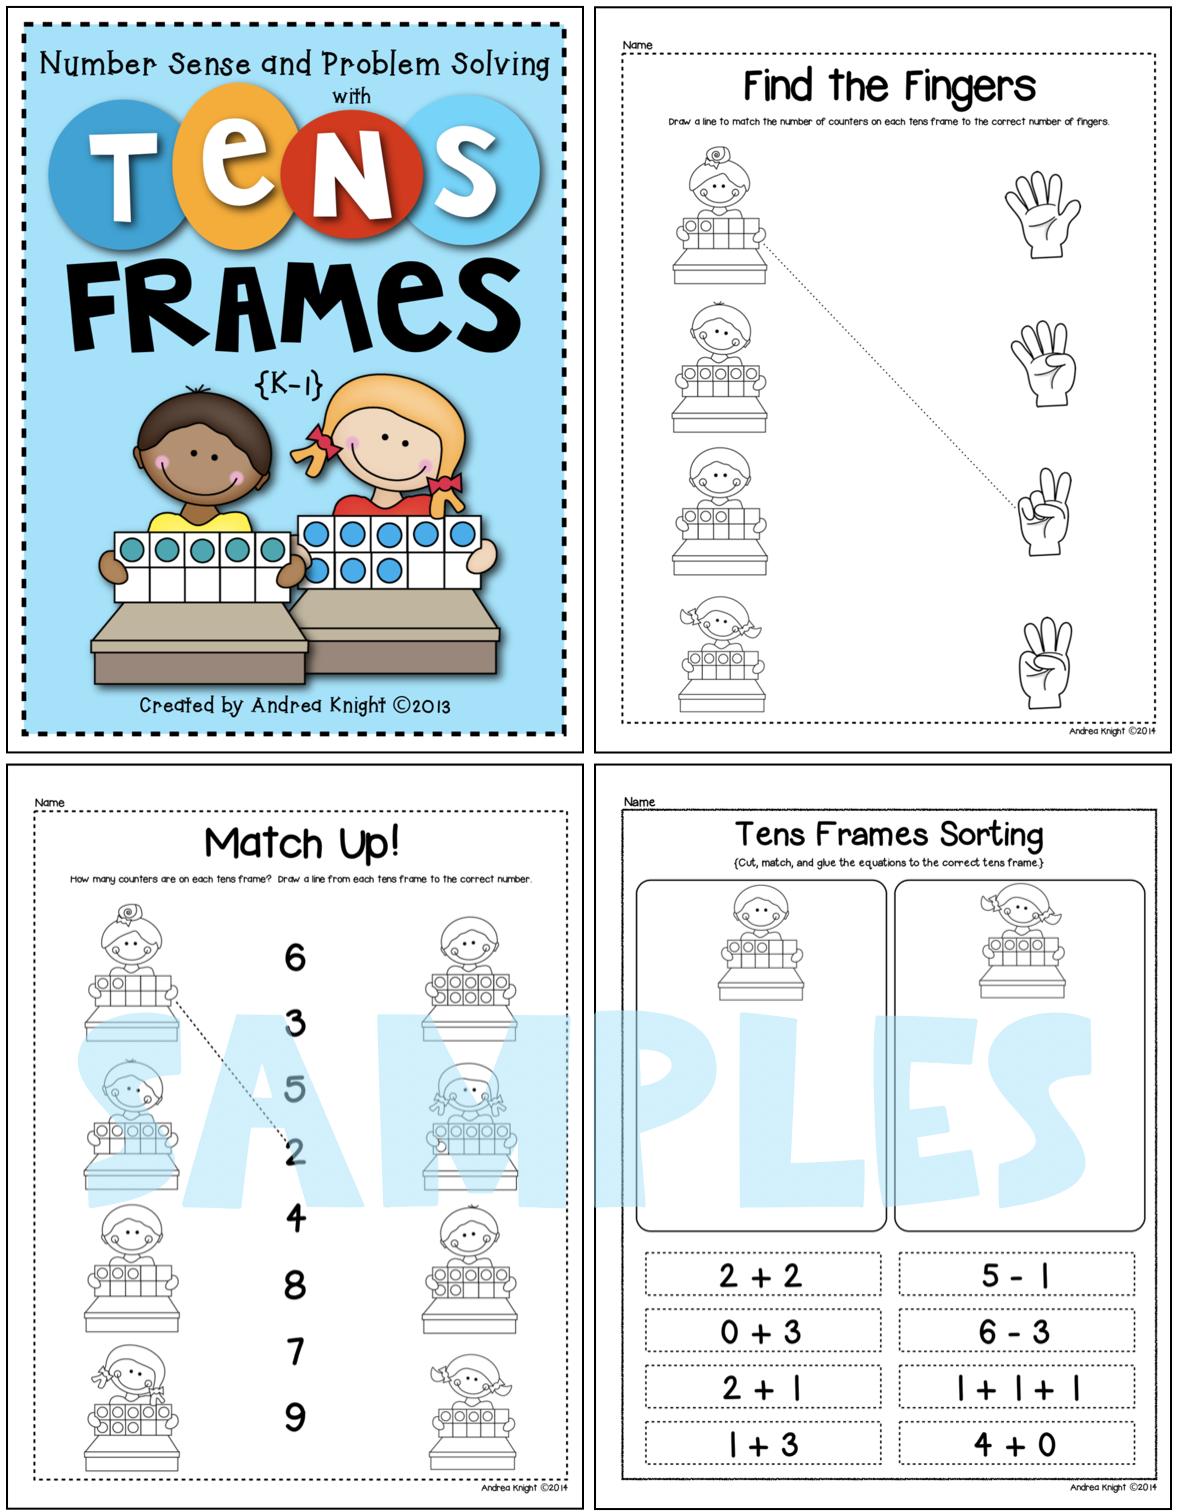 Problem Solving Using Tens Frames Math Worksheets For K 1 Distance Learning Math Practice Worksheets Math Worksheets Ten Frame [ 1512 x 1180 Pixel ]